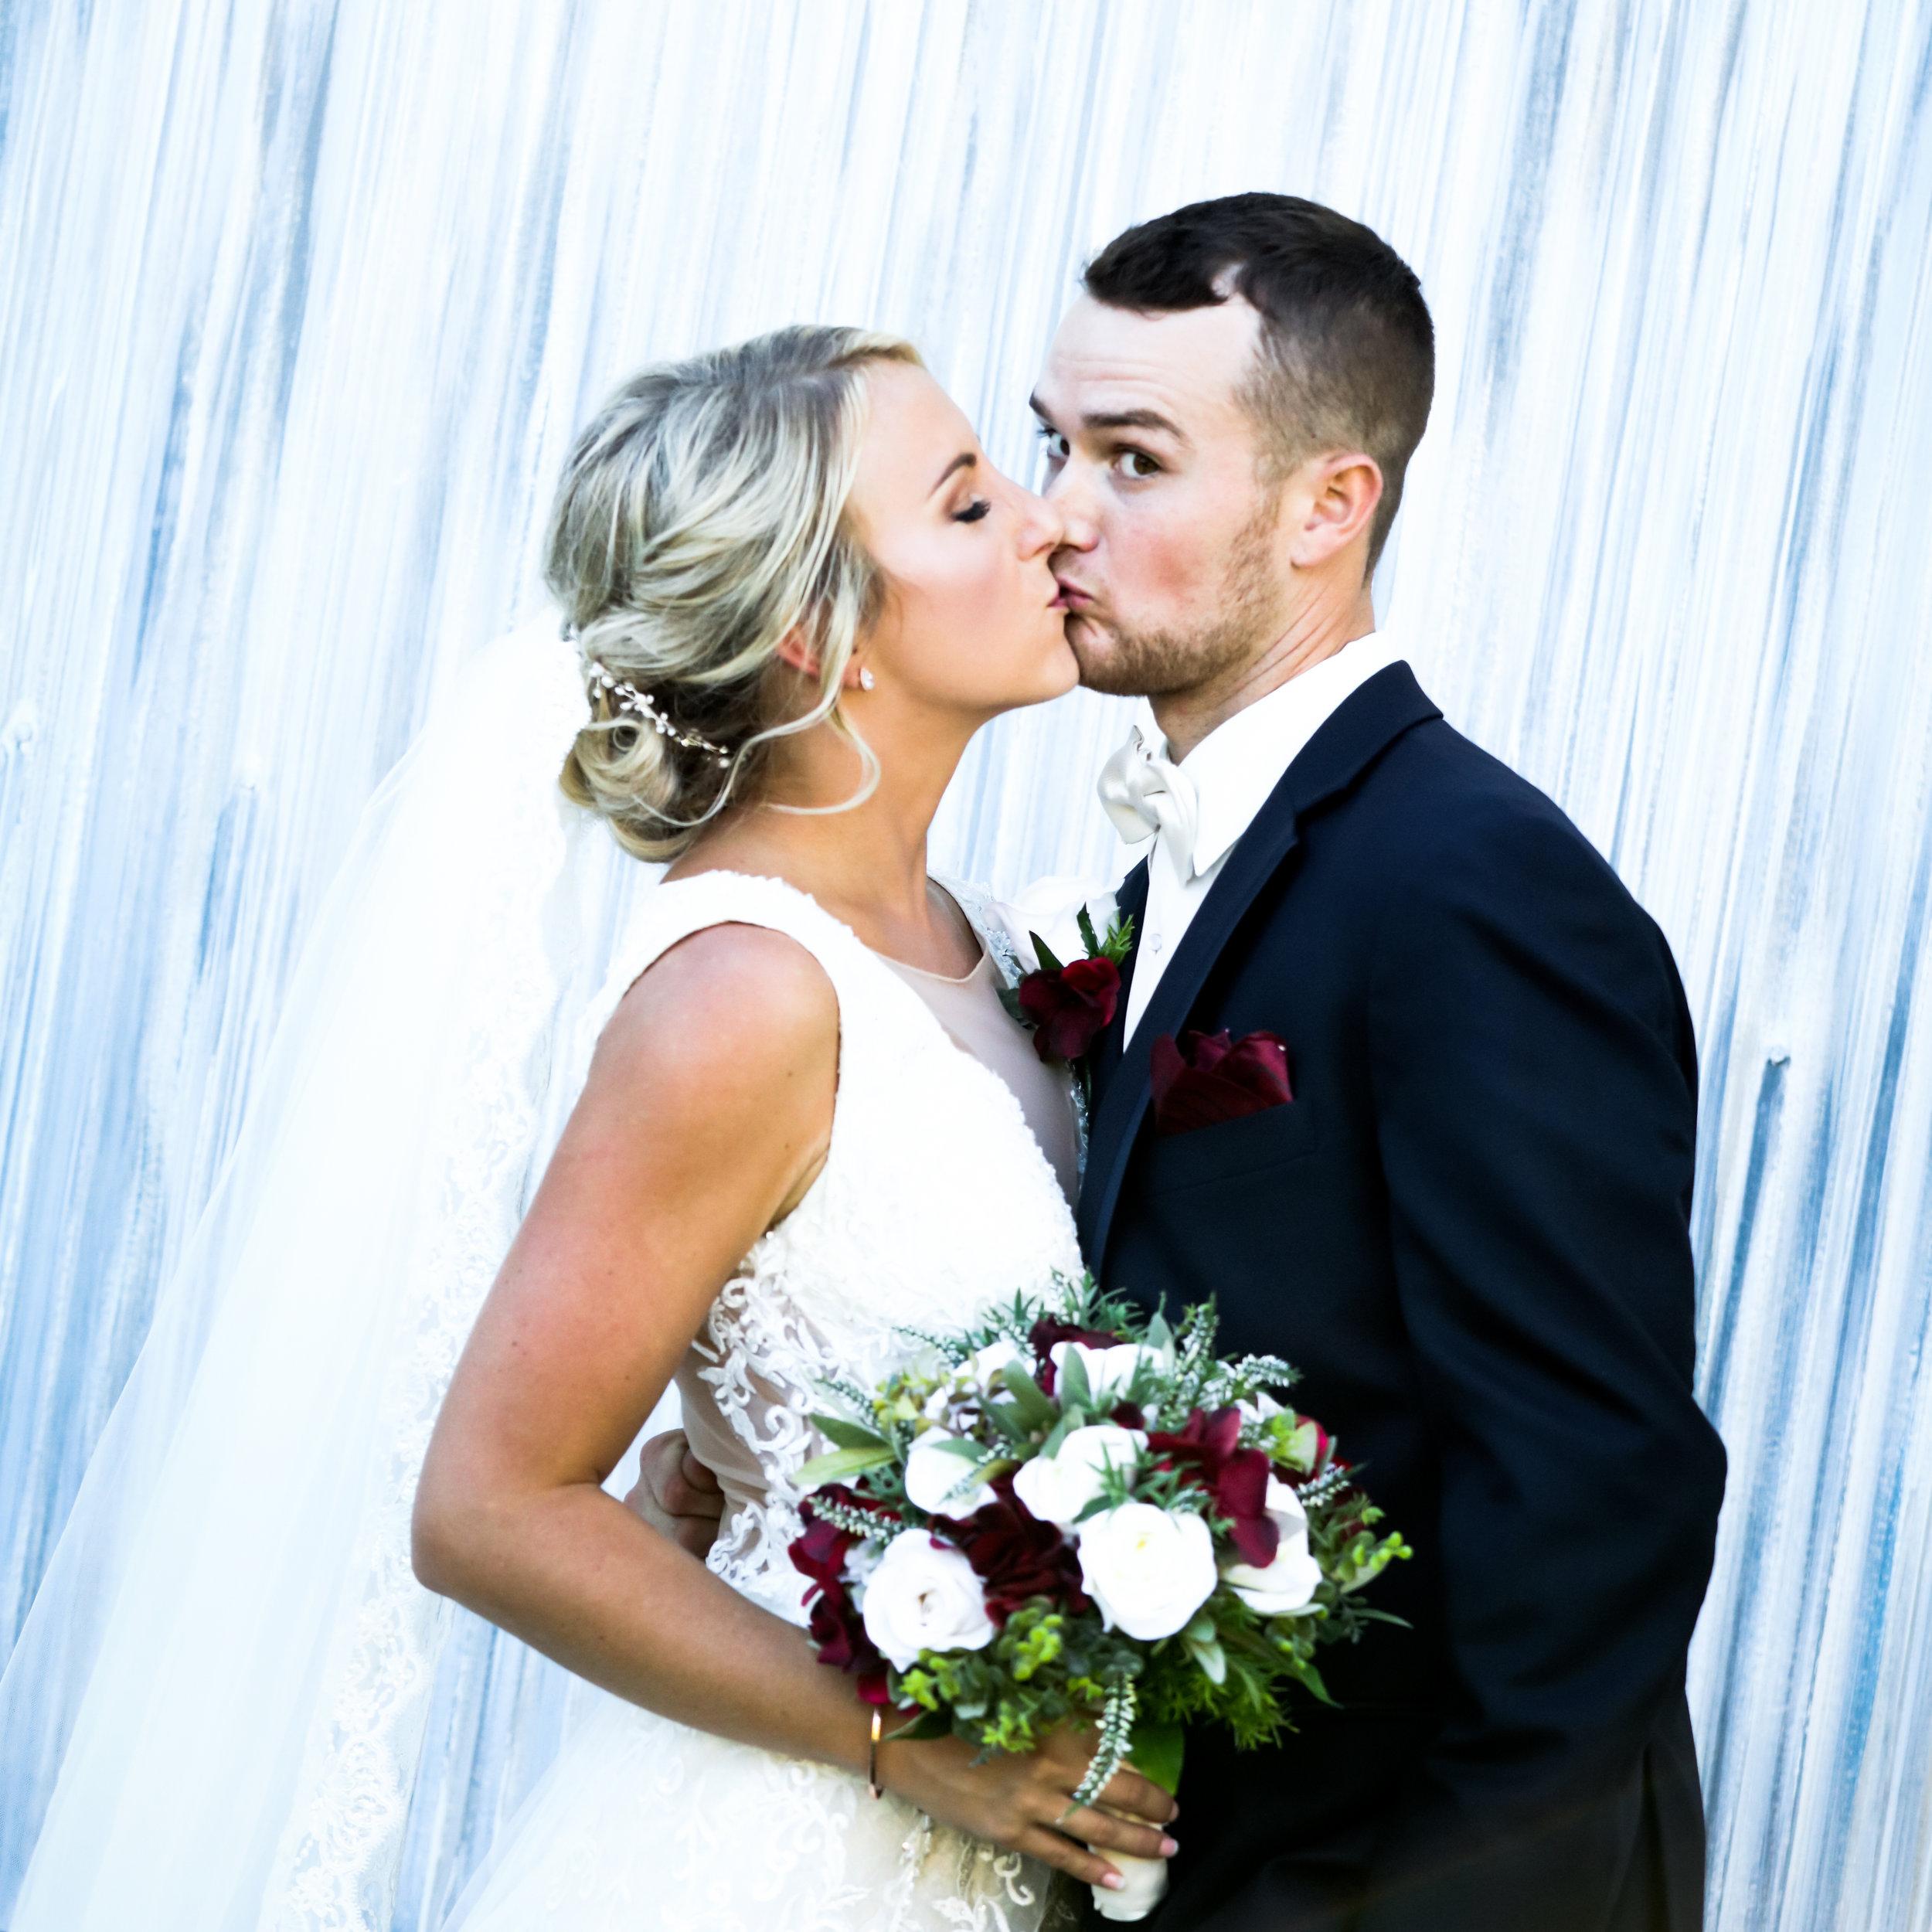 WeddingWebsite-75.jpg